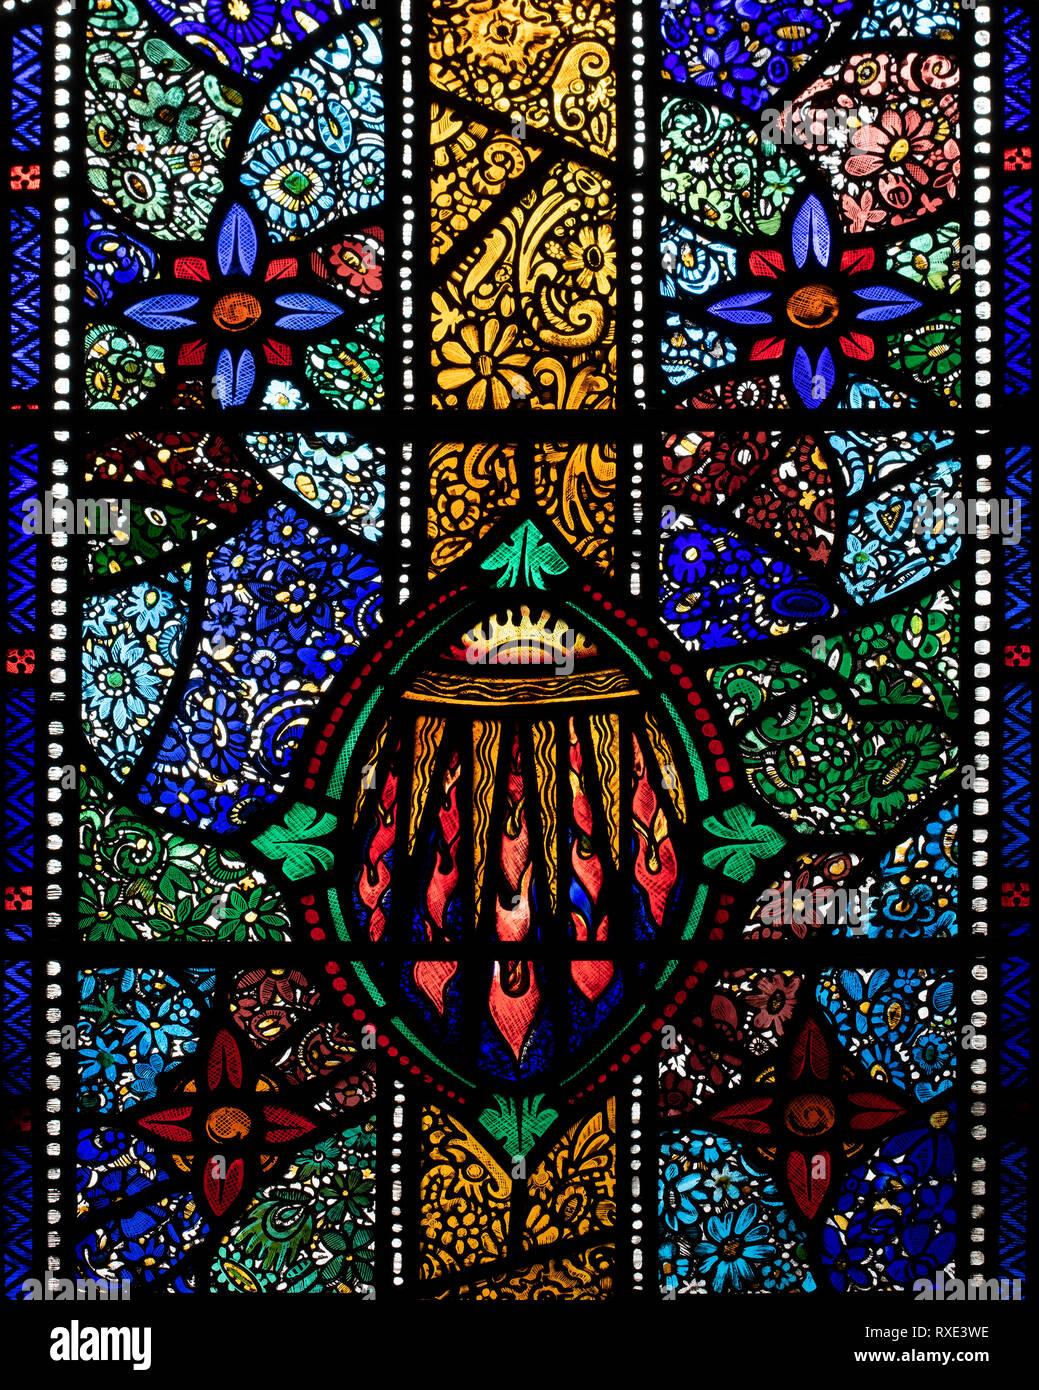 Part of the joyful 'Pentecost' millenium window in St. Oswald & St. Edmund Church, Ashton-in-Makerfield, Greater Manchester, UK - Stock Image